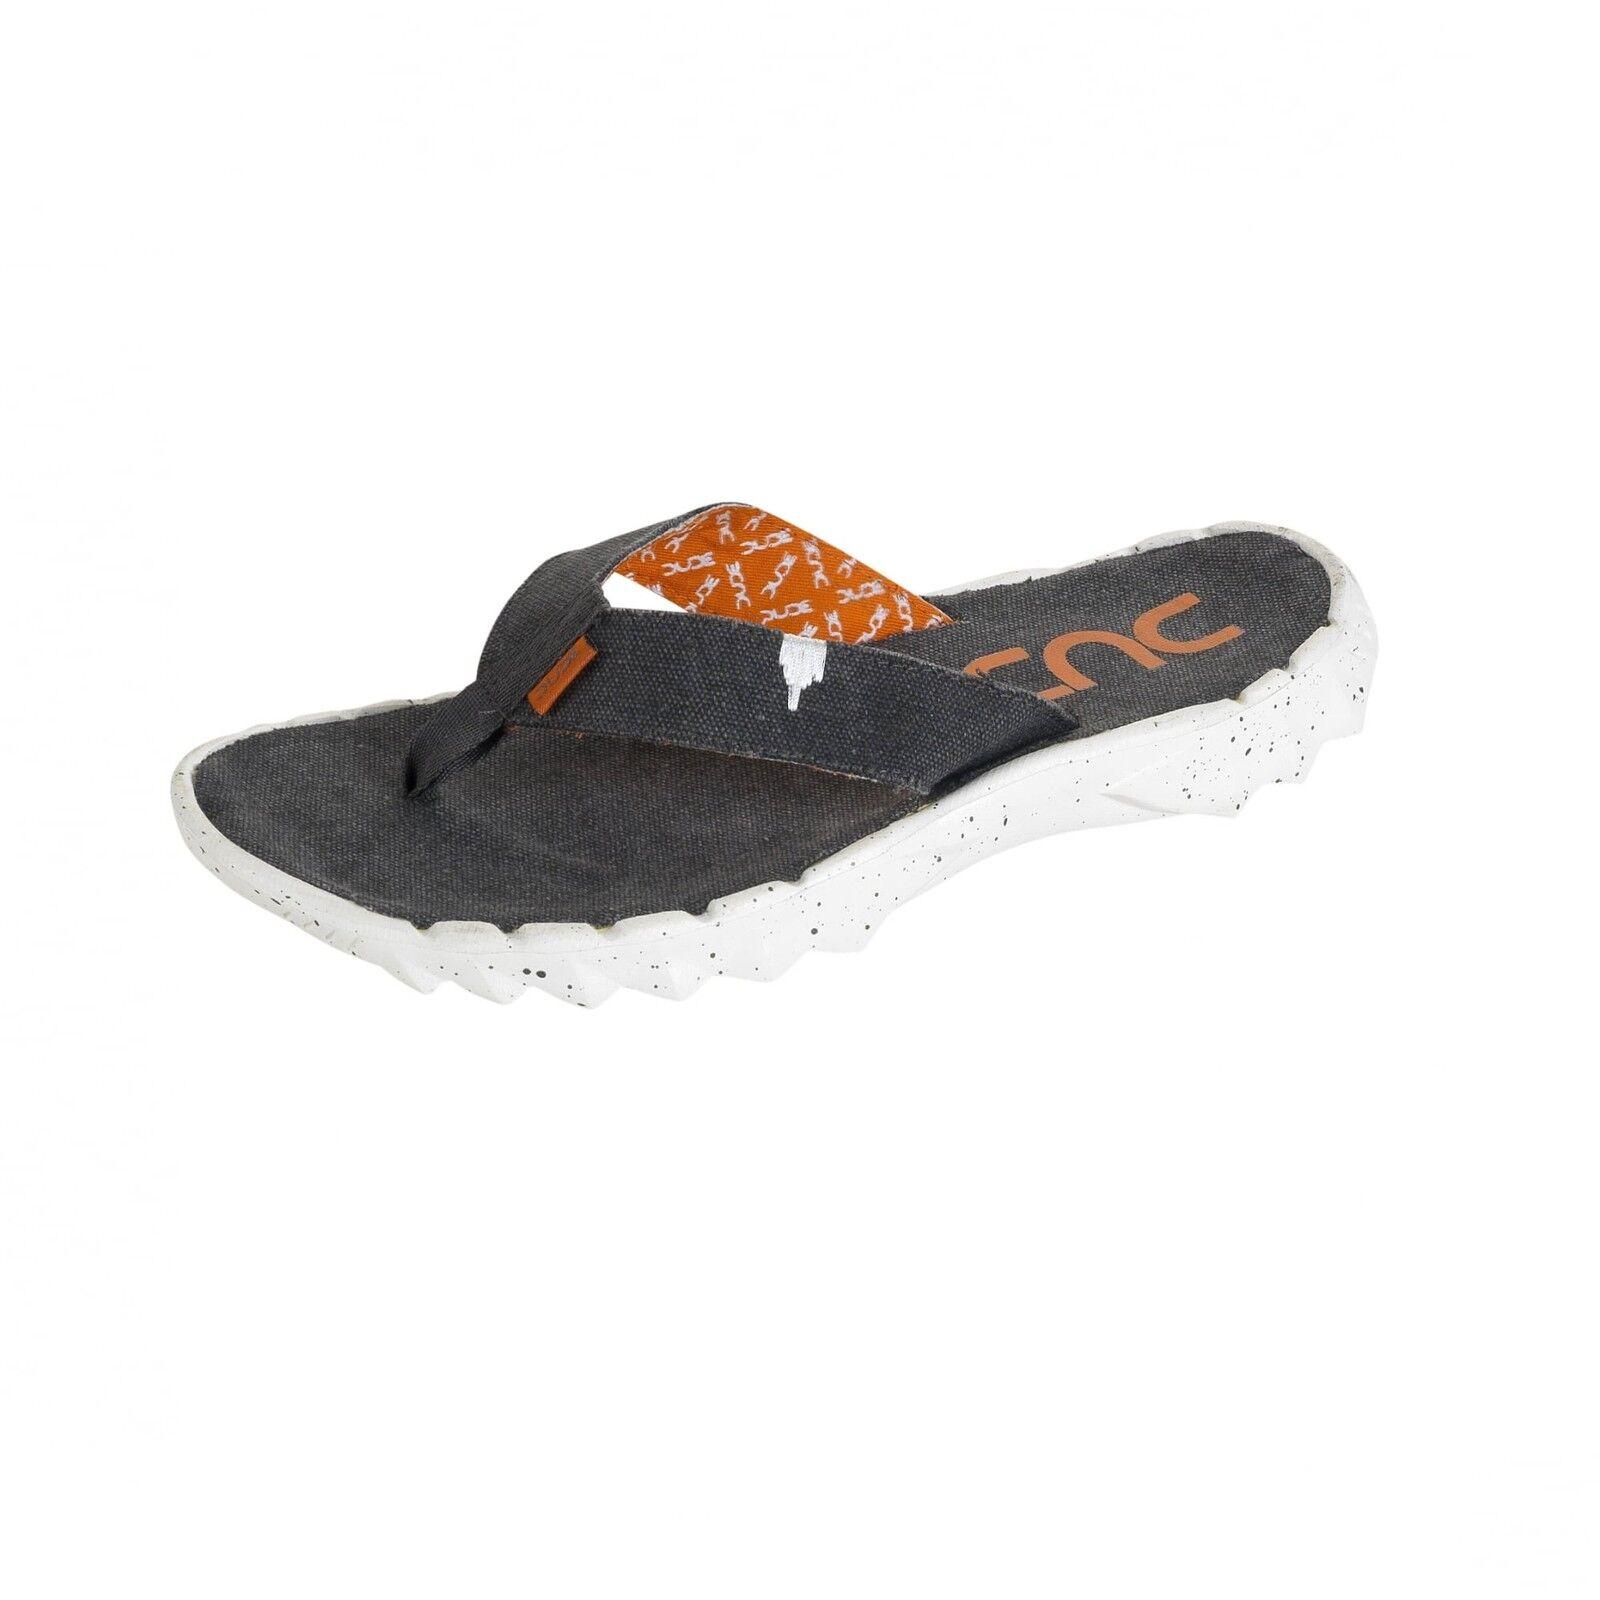 Hey Dude shoes Mens & Womens Sava Funk Ossidiana Canvas Flip Flops